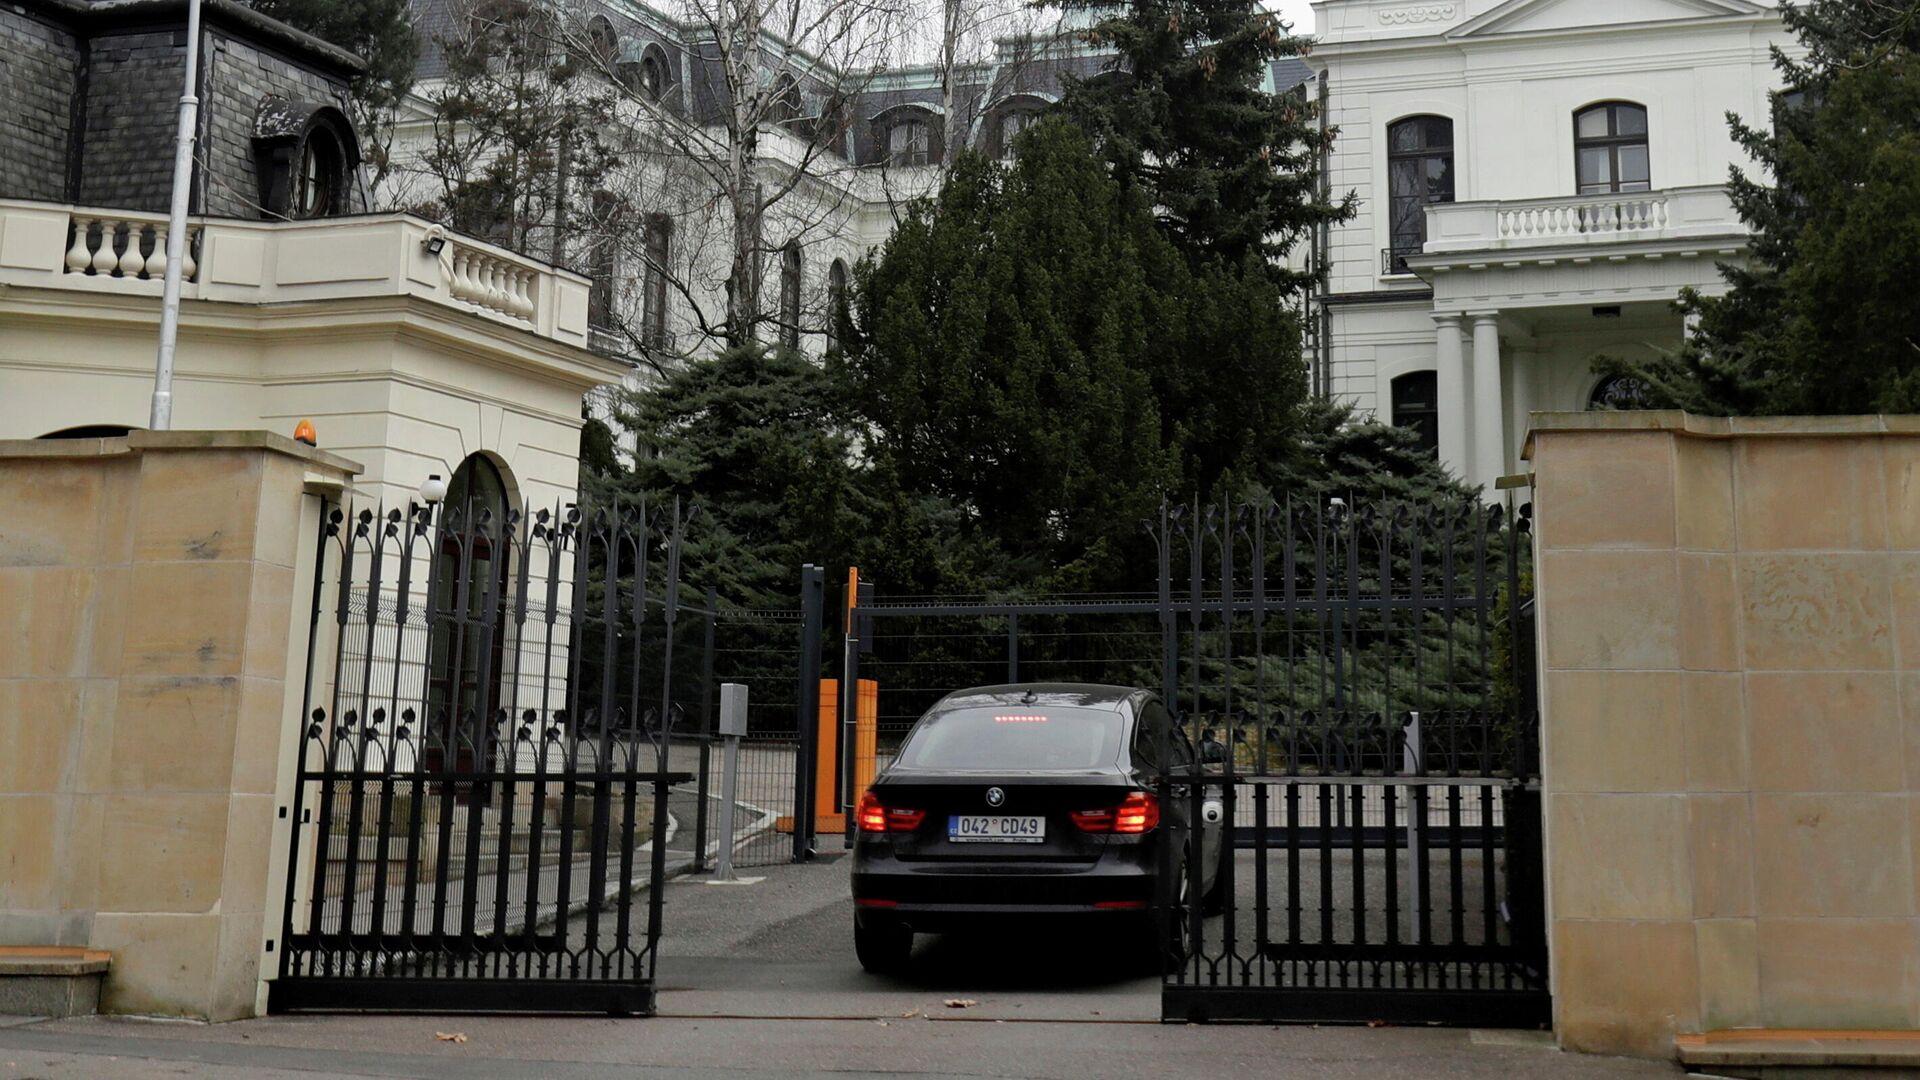 La Embajada rusa en Praga, República Checa - Sputnik Mundo, 1920, 22.04.2021